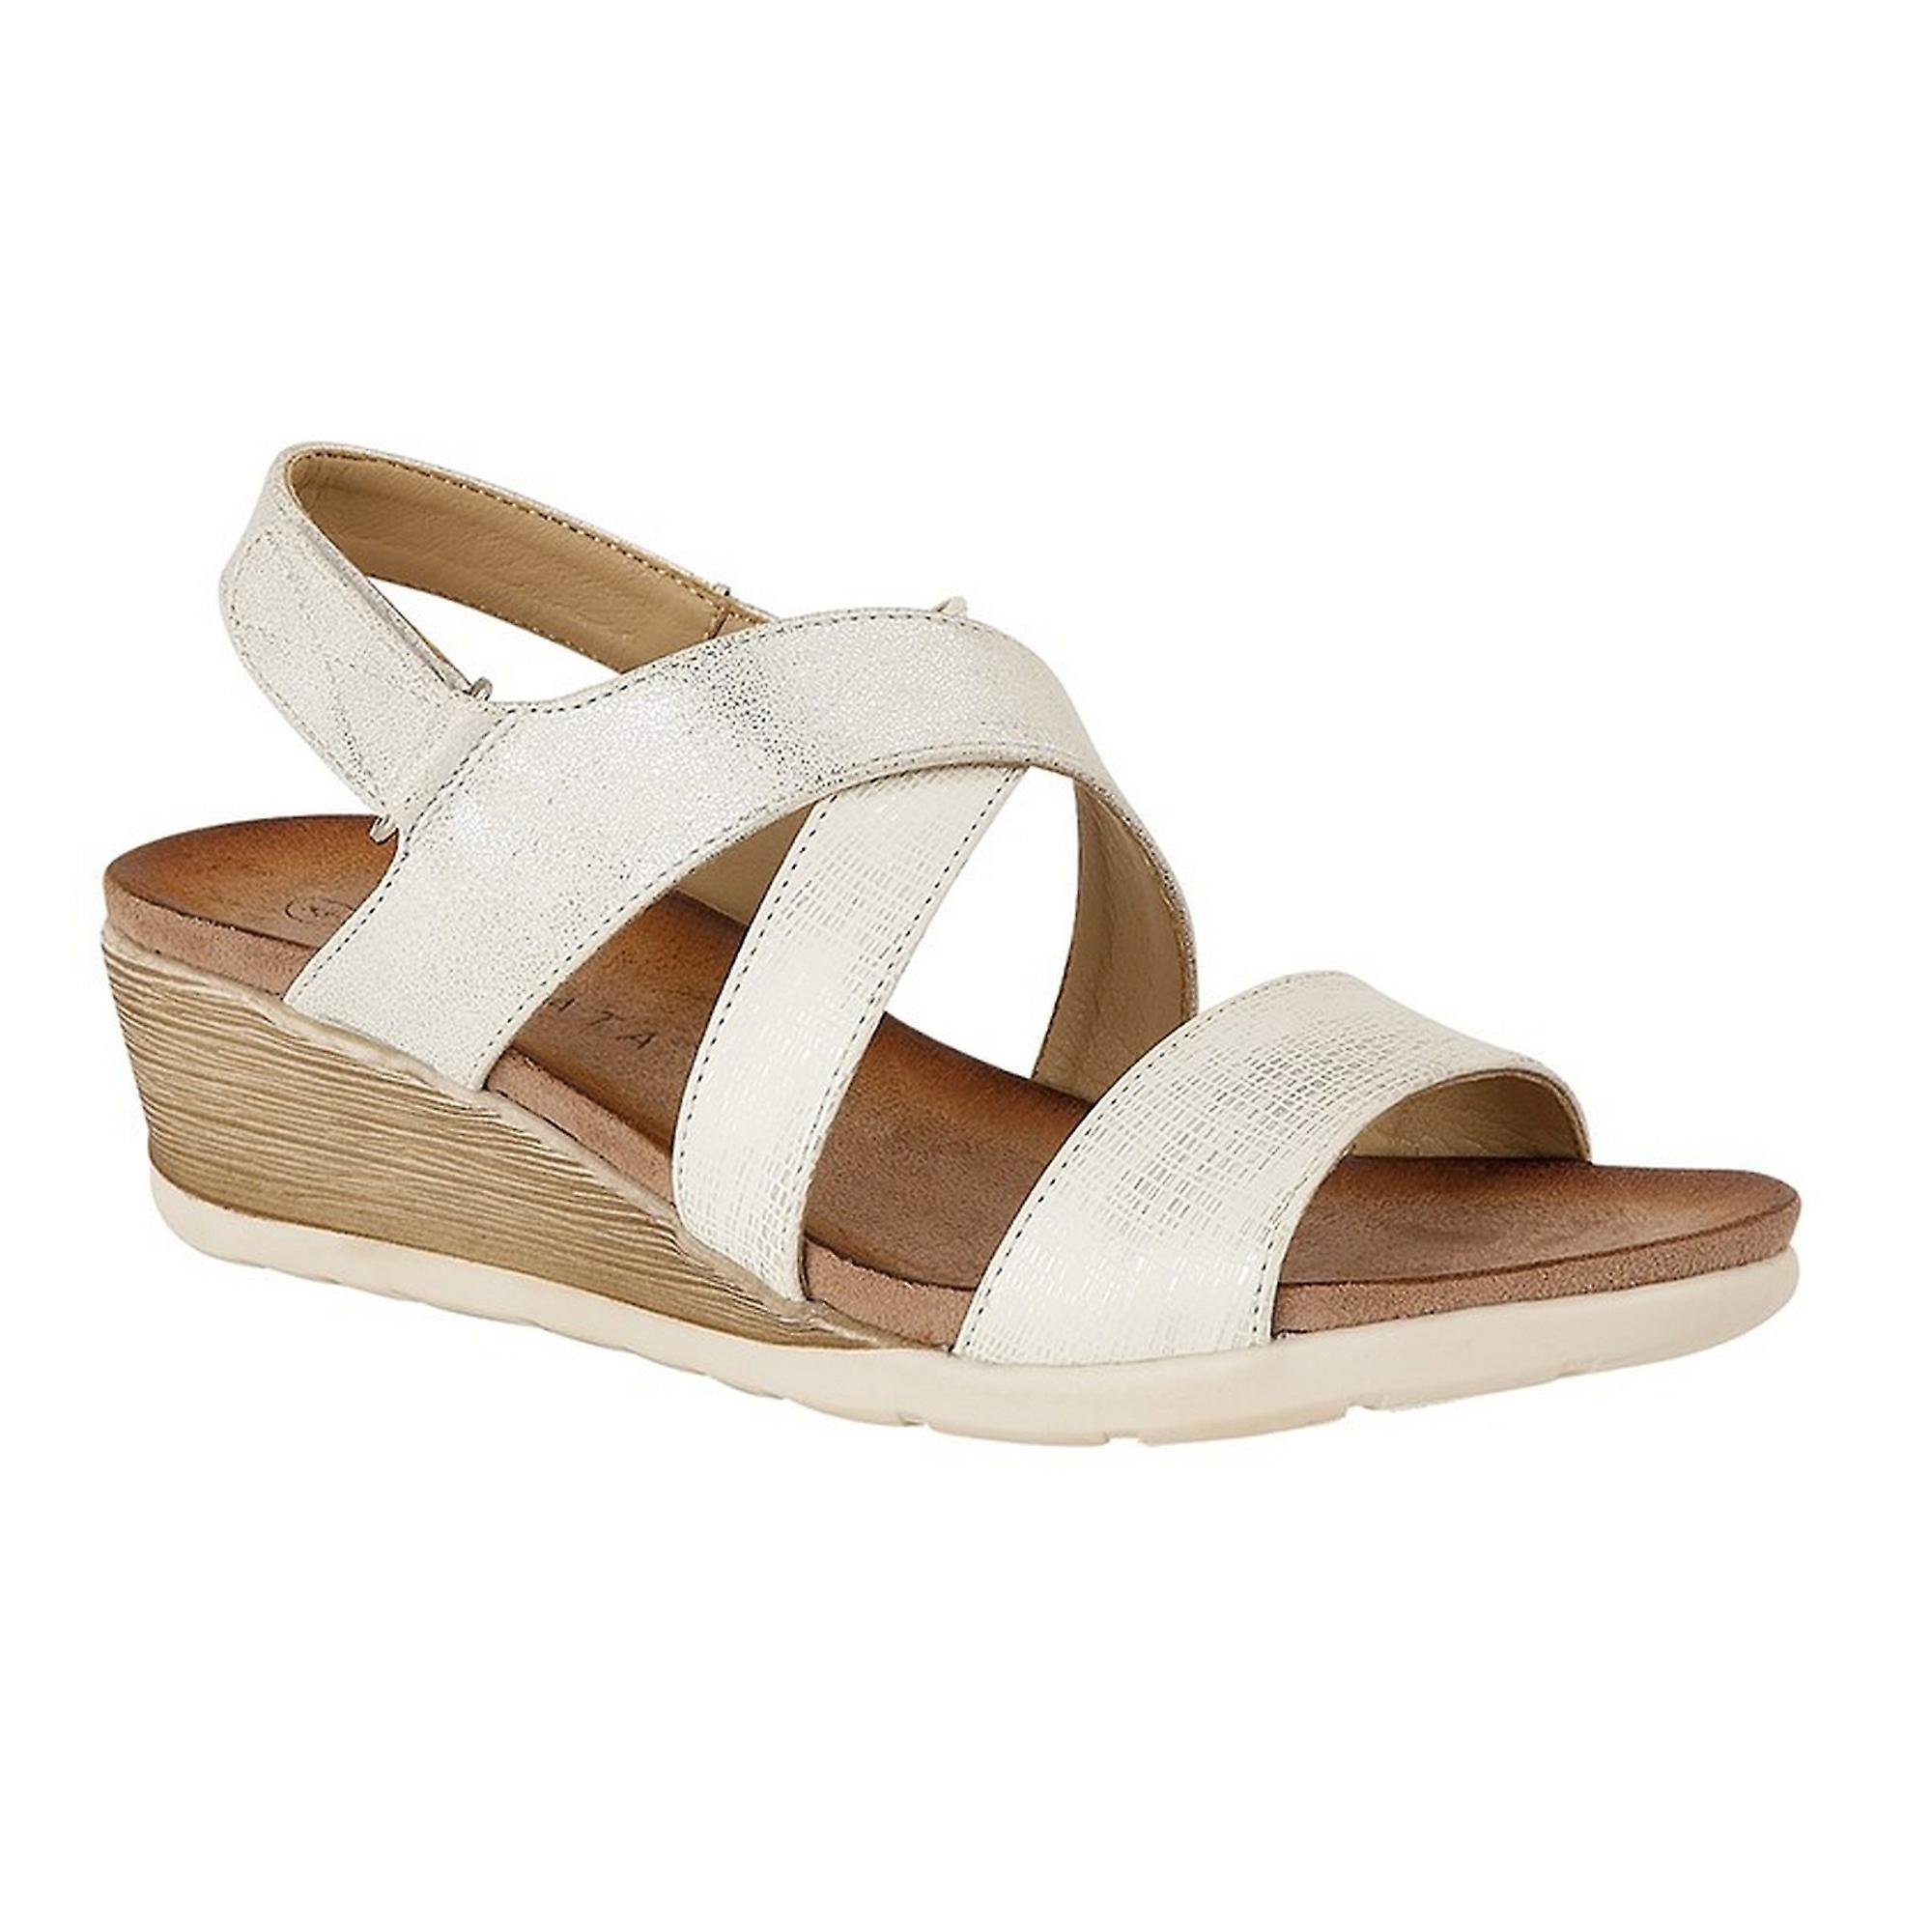 Cipriata Womens/Ladies Bina Crossover Wedge Sandal